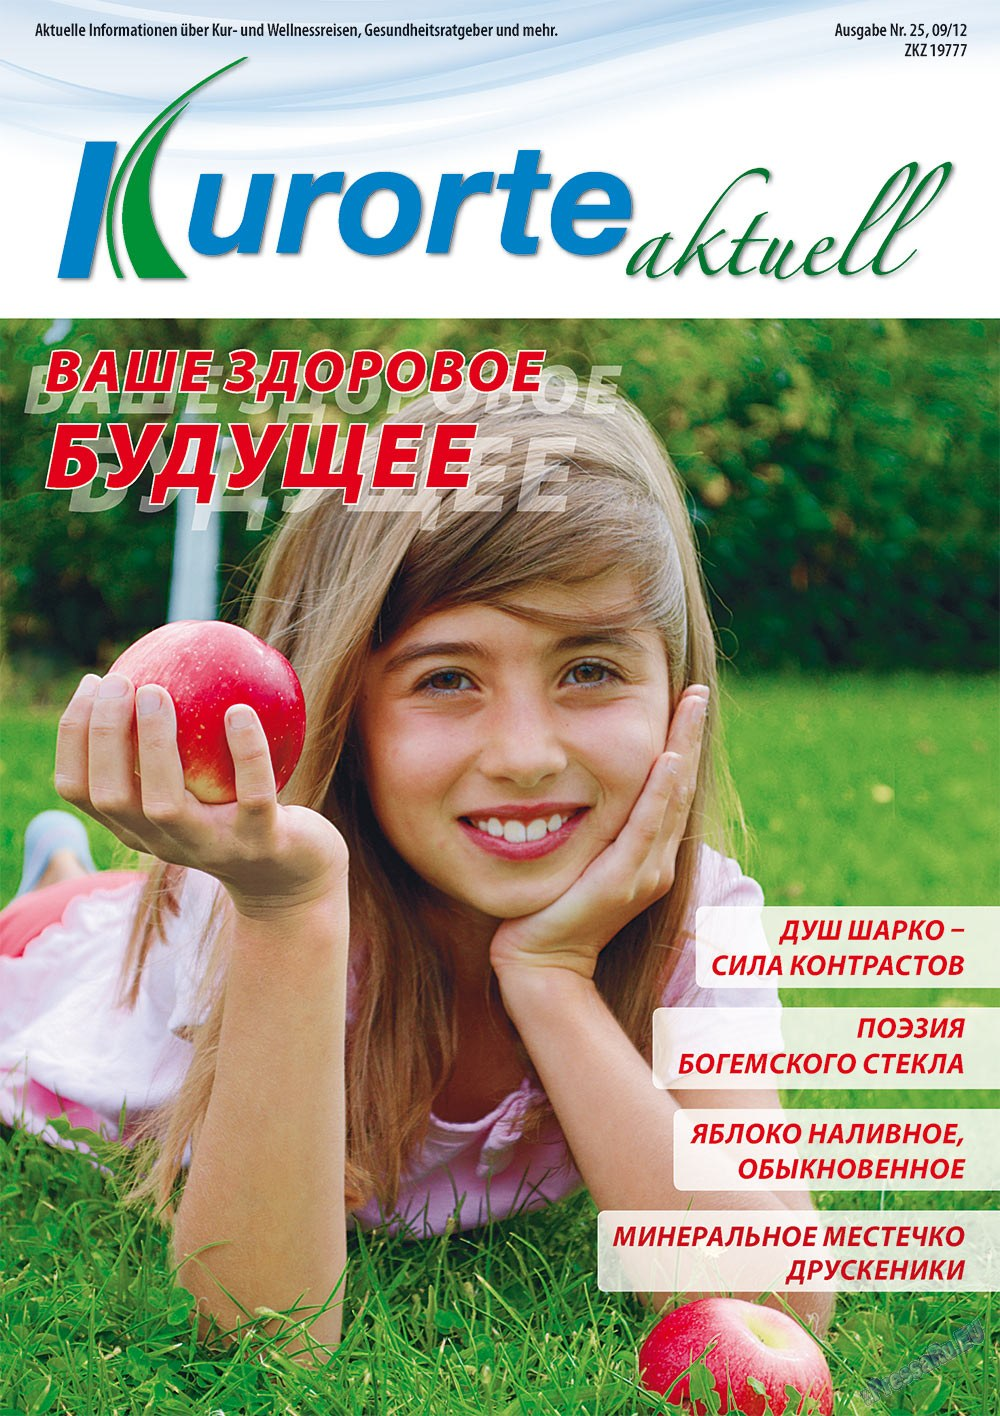 Kurorte aktuell (газета). 2012 год, номер 25, стр. 1